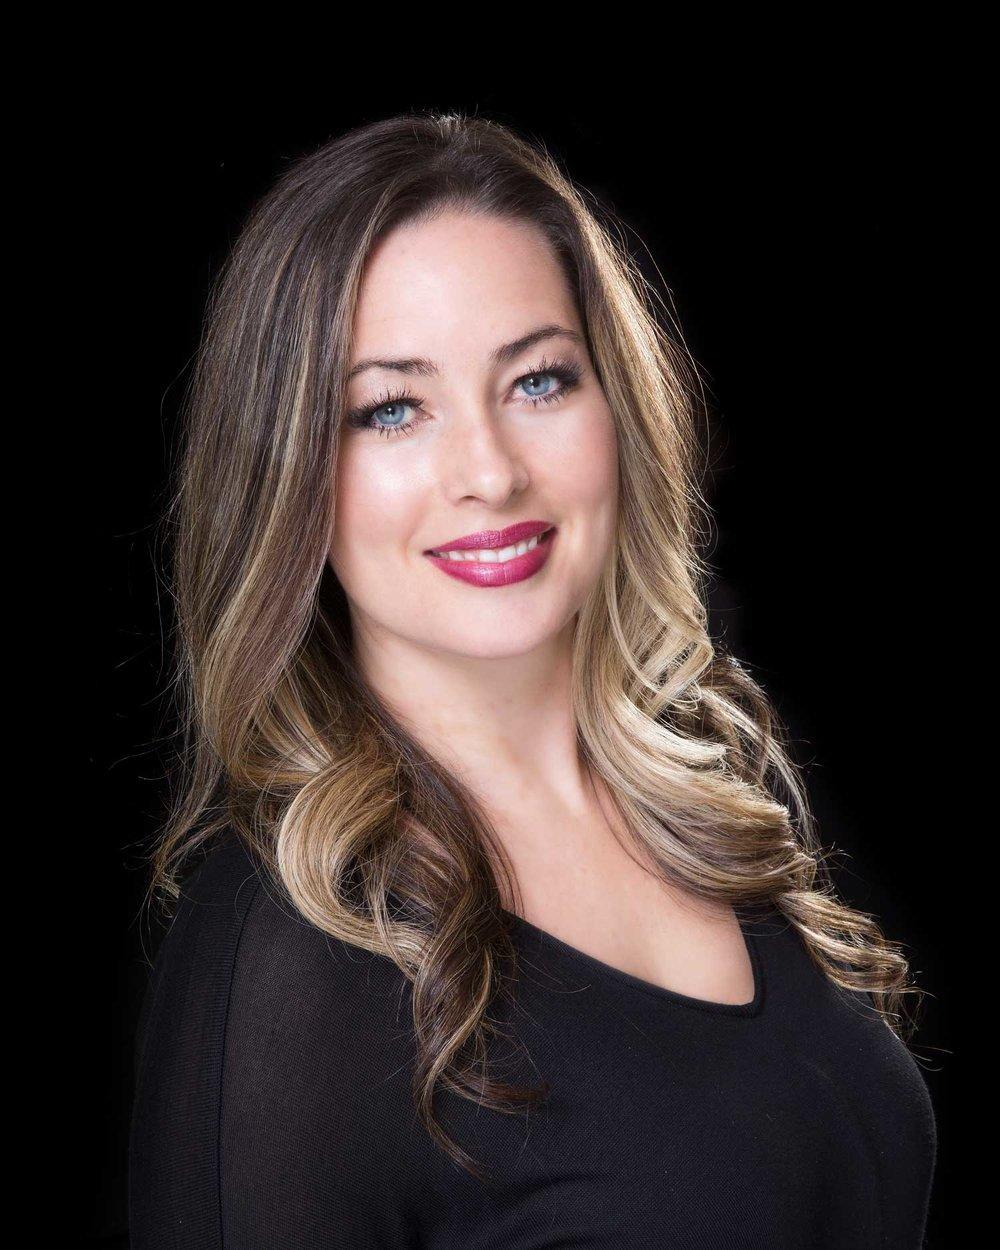 Christie Romero